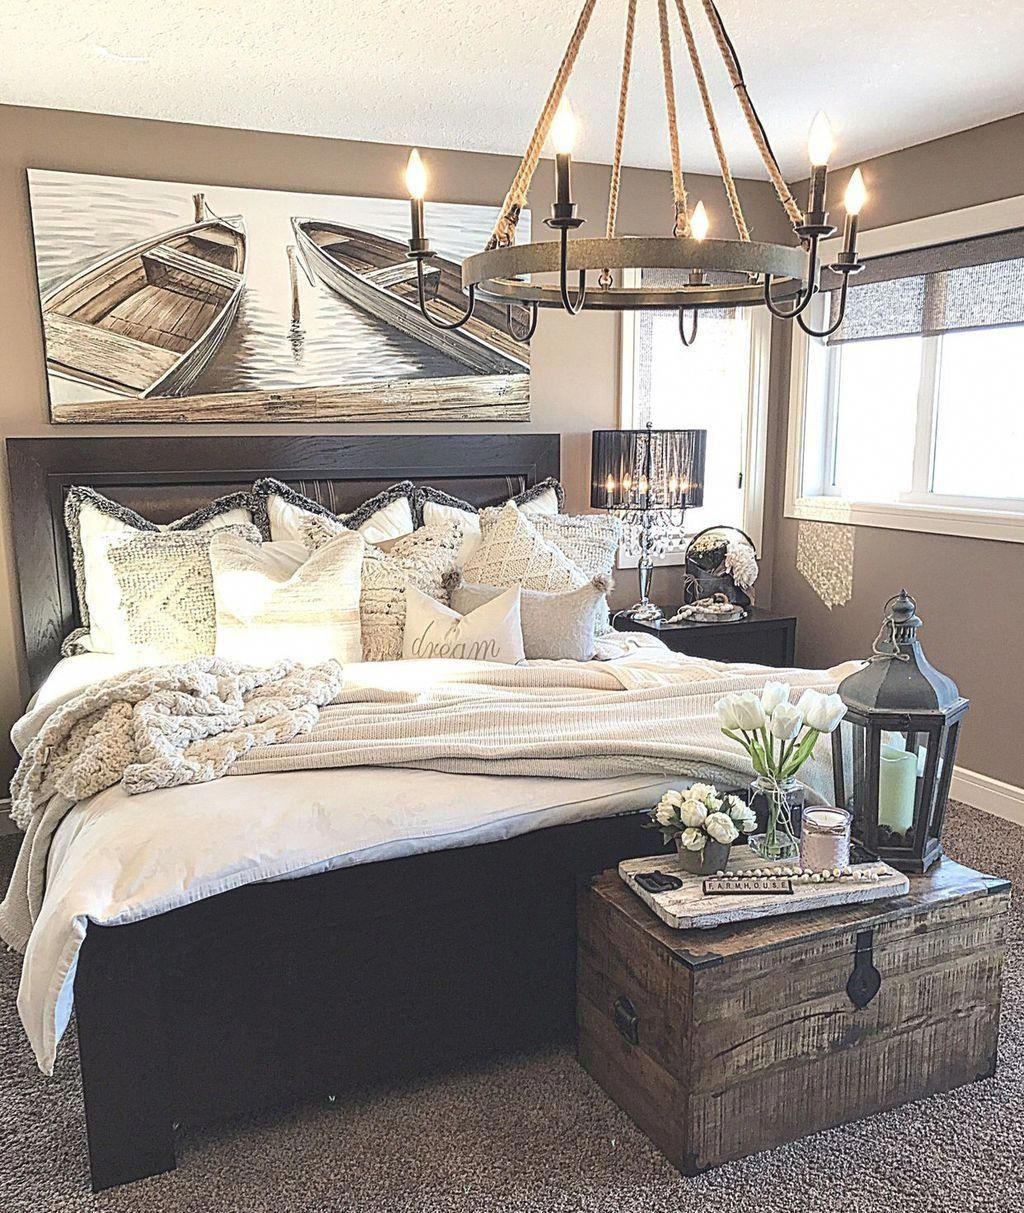 20 Enchanting Lake House Bedroom Design And Decor Ideas In 2020 Lakehouse Bedroom Home Bedroom Home Decor Bedroom